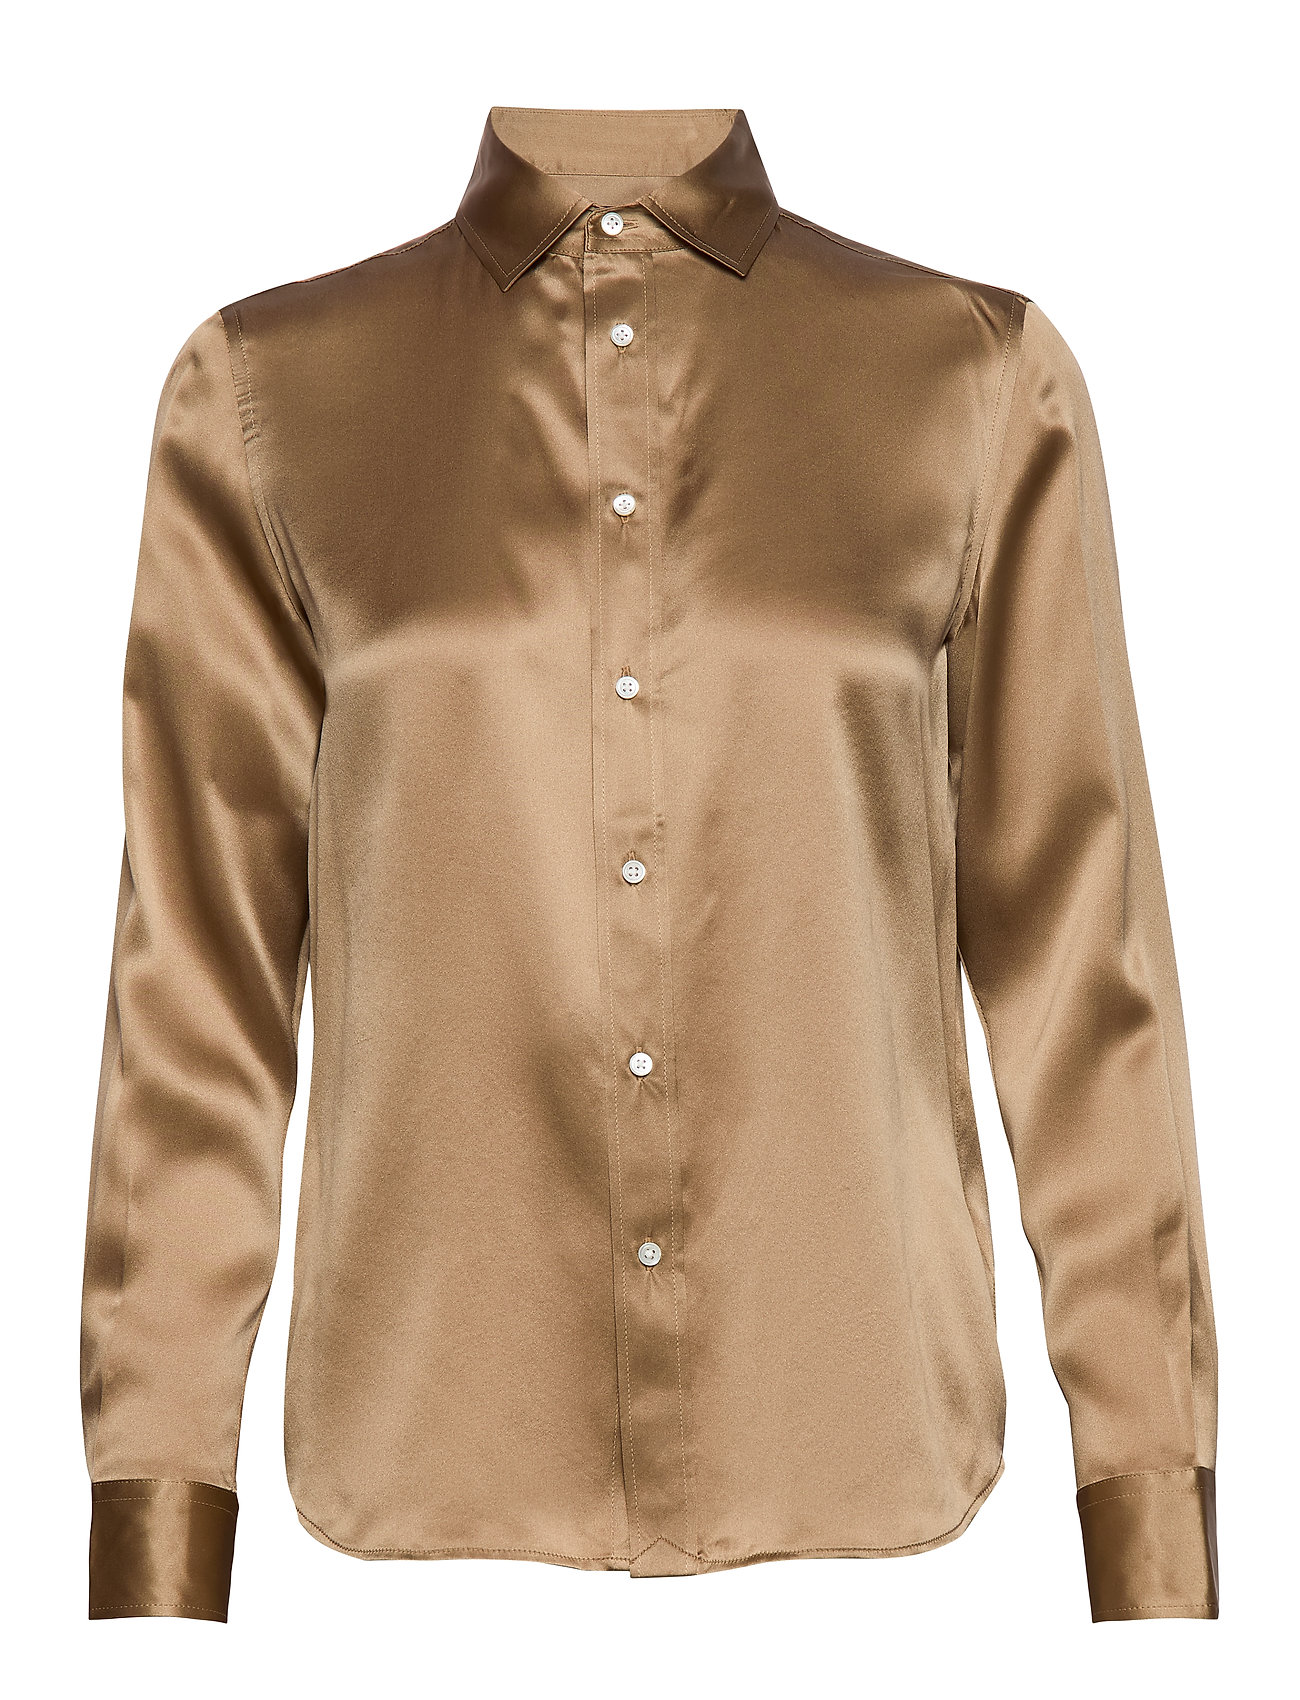 Polo Ralph Lauren Silk Charmeuse Shirt - MONTANA KHAKI